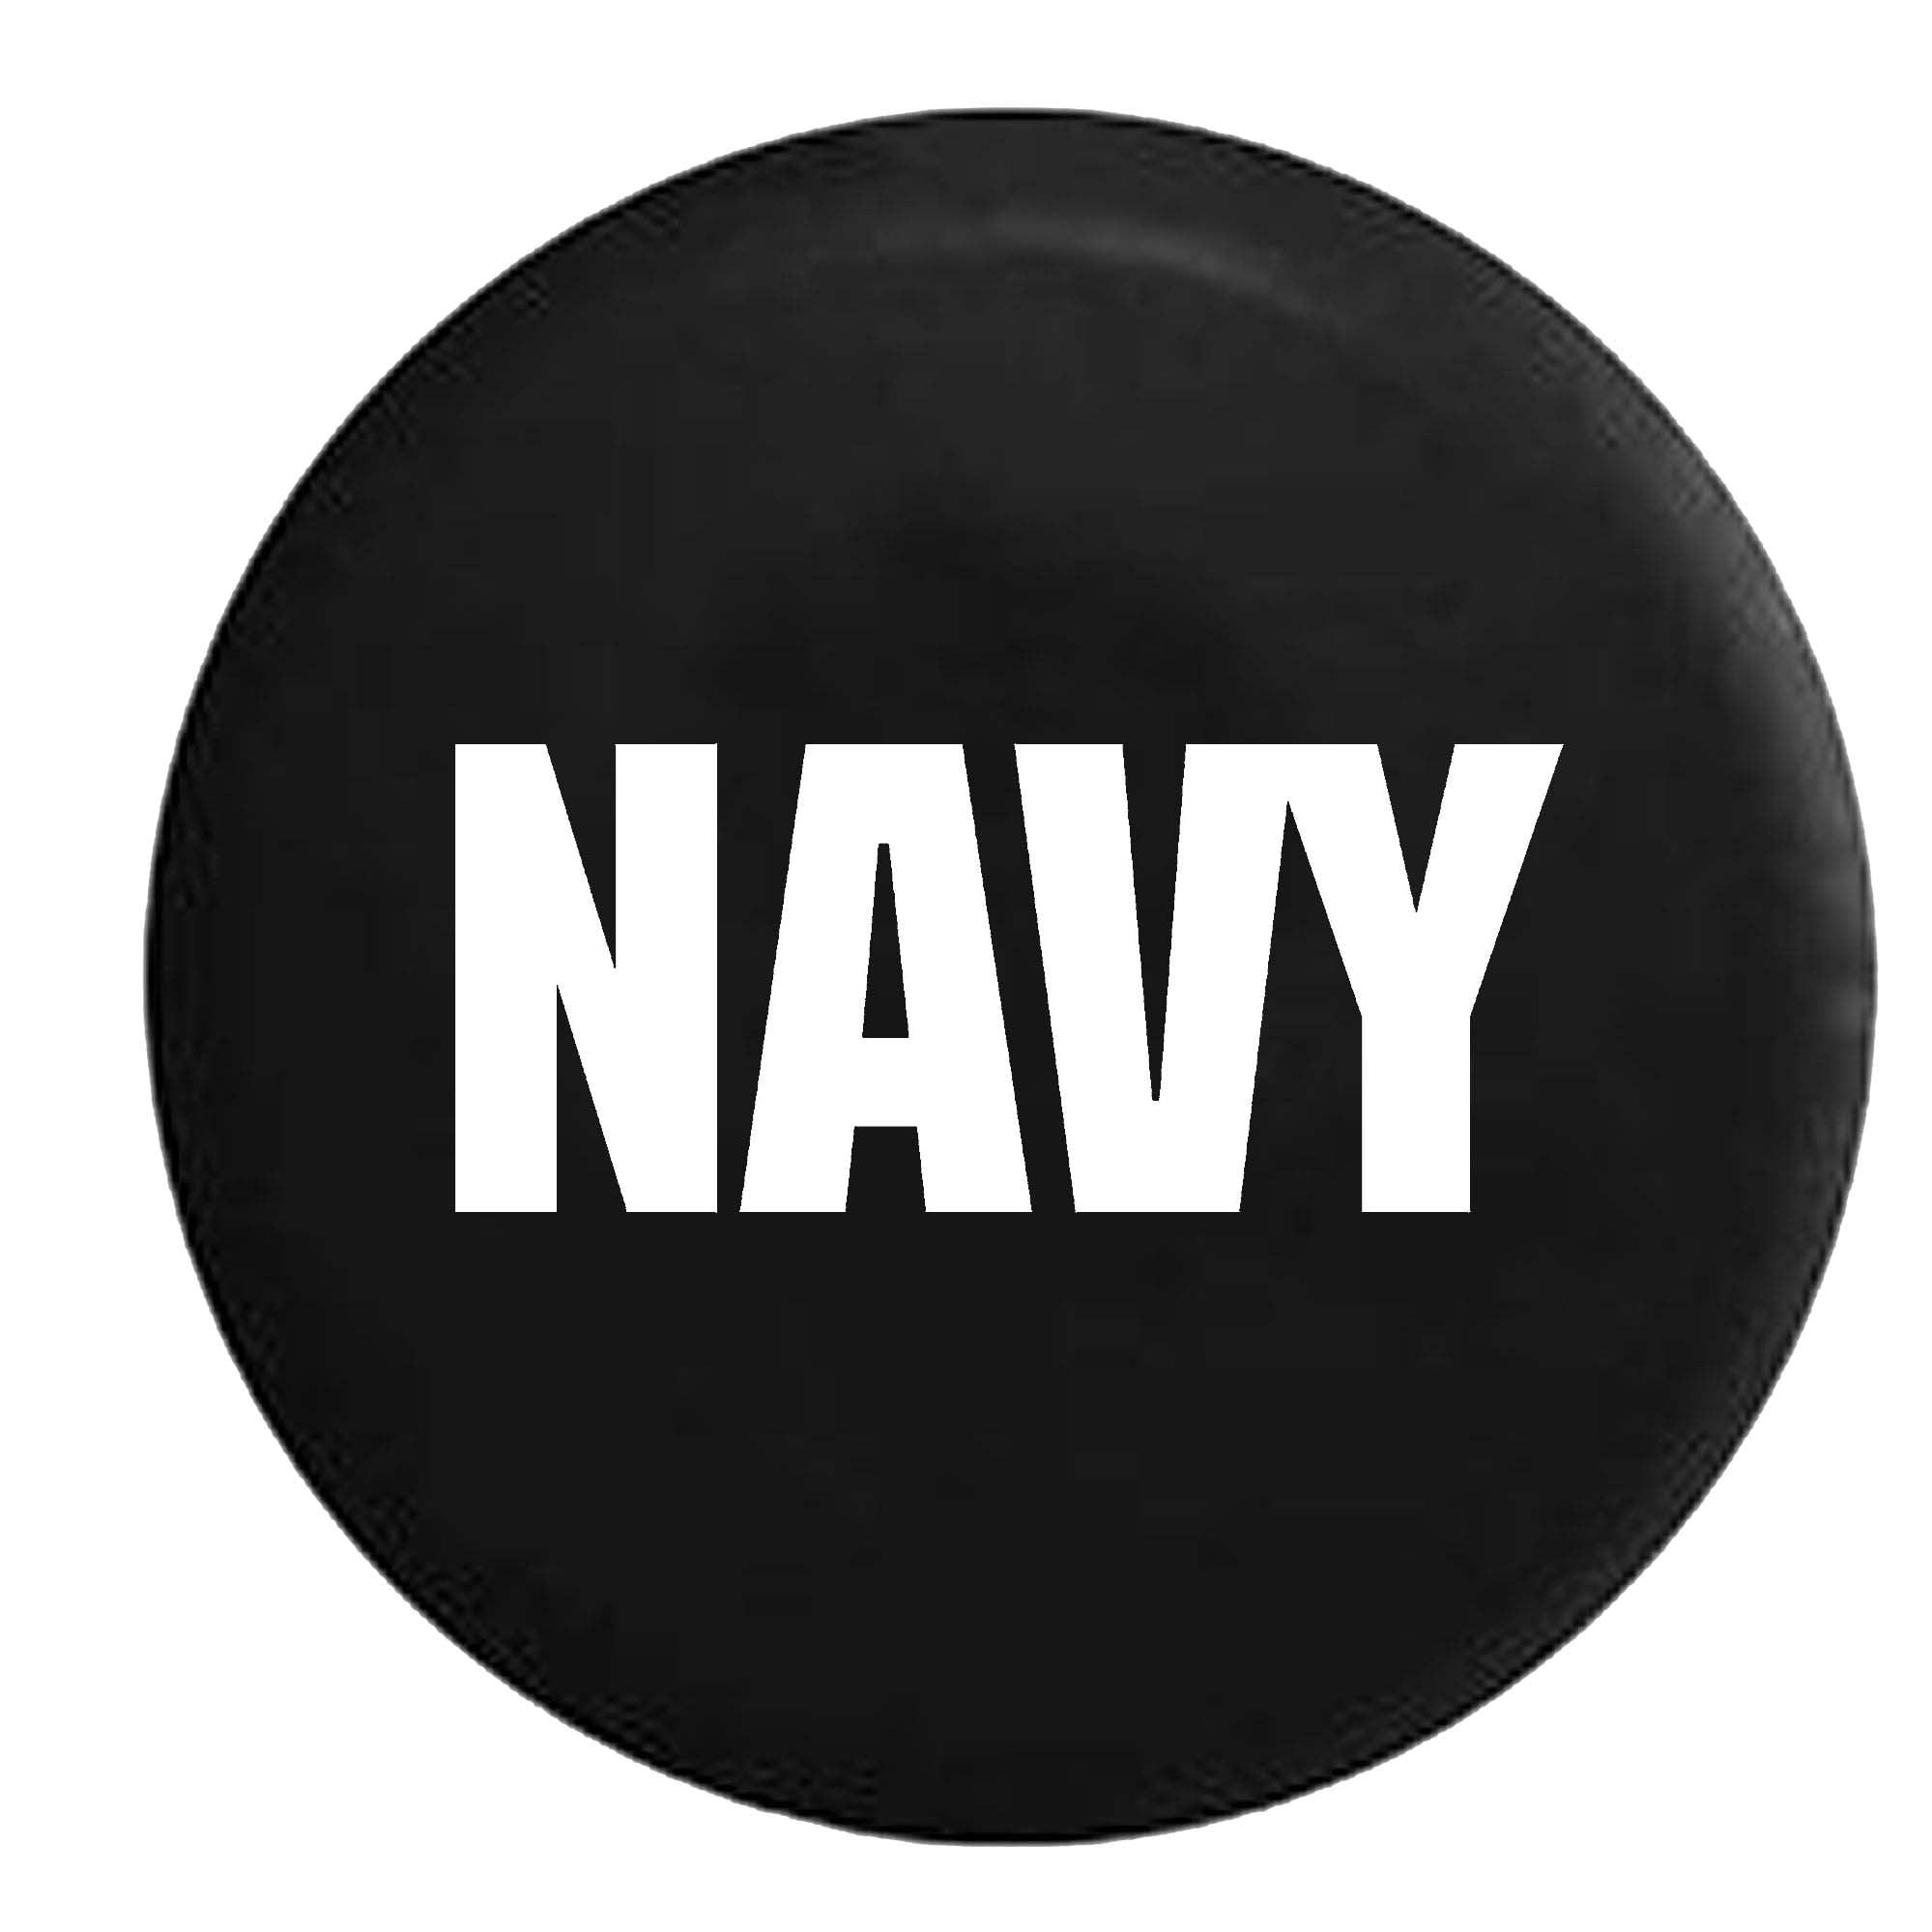 US NAVY Military Trailer RV Spare Tire Cover Vinyl Black 27.5 in